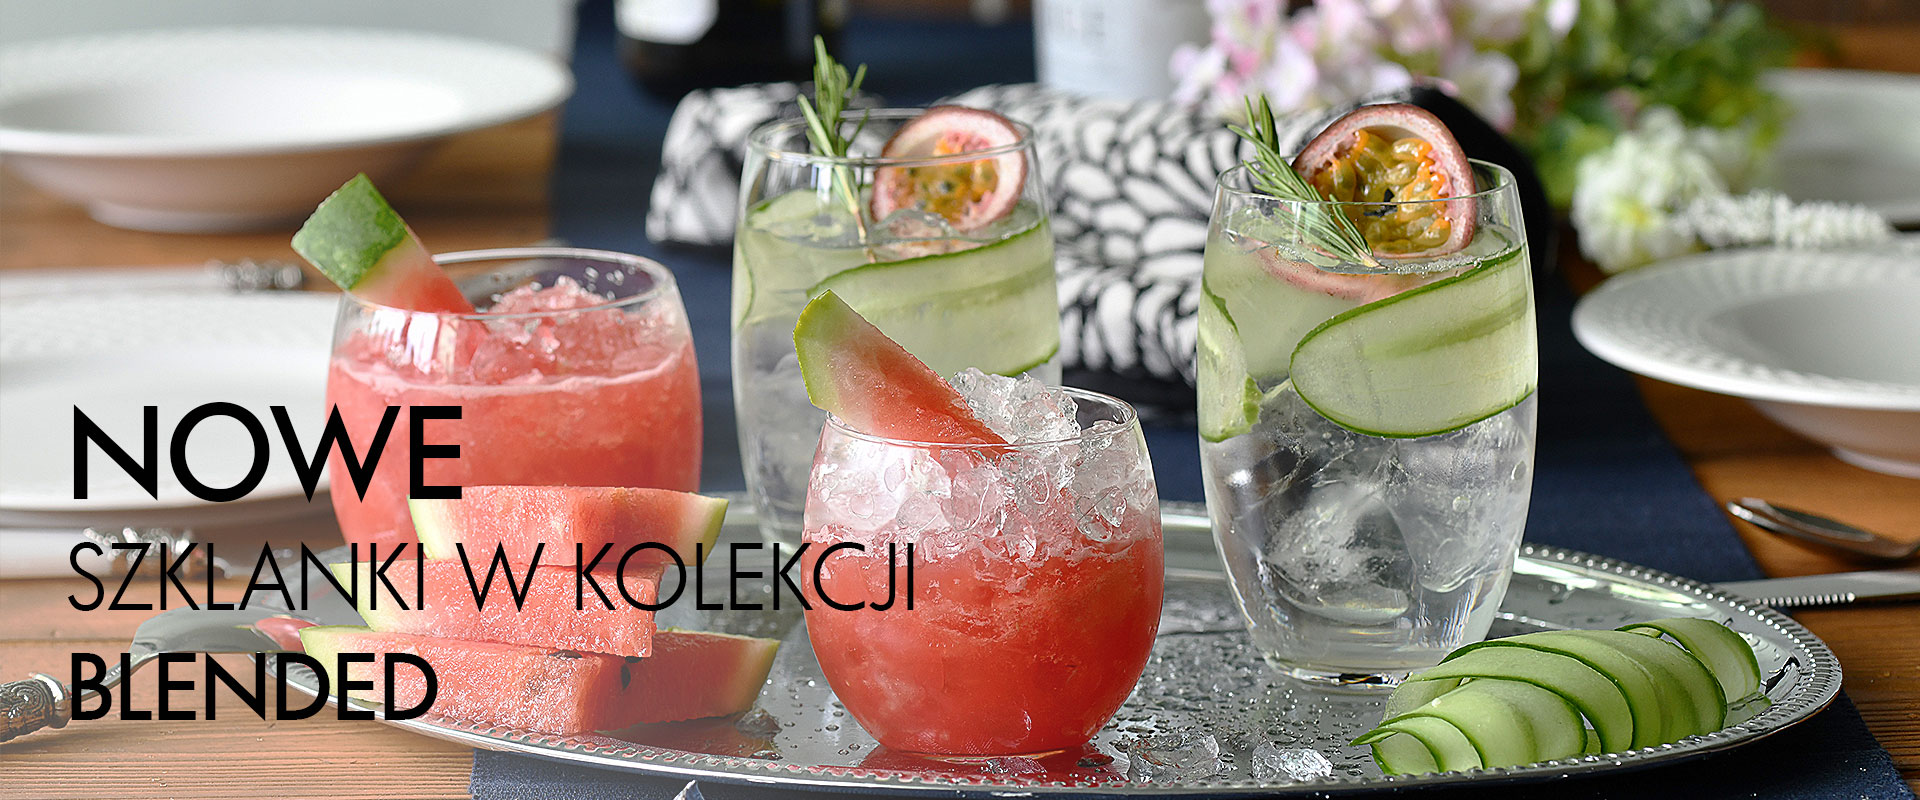 Nowe szklanki w kolekcji Blended KROSNO